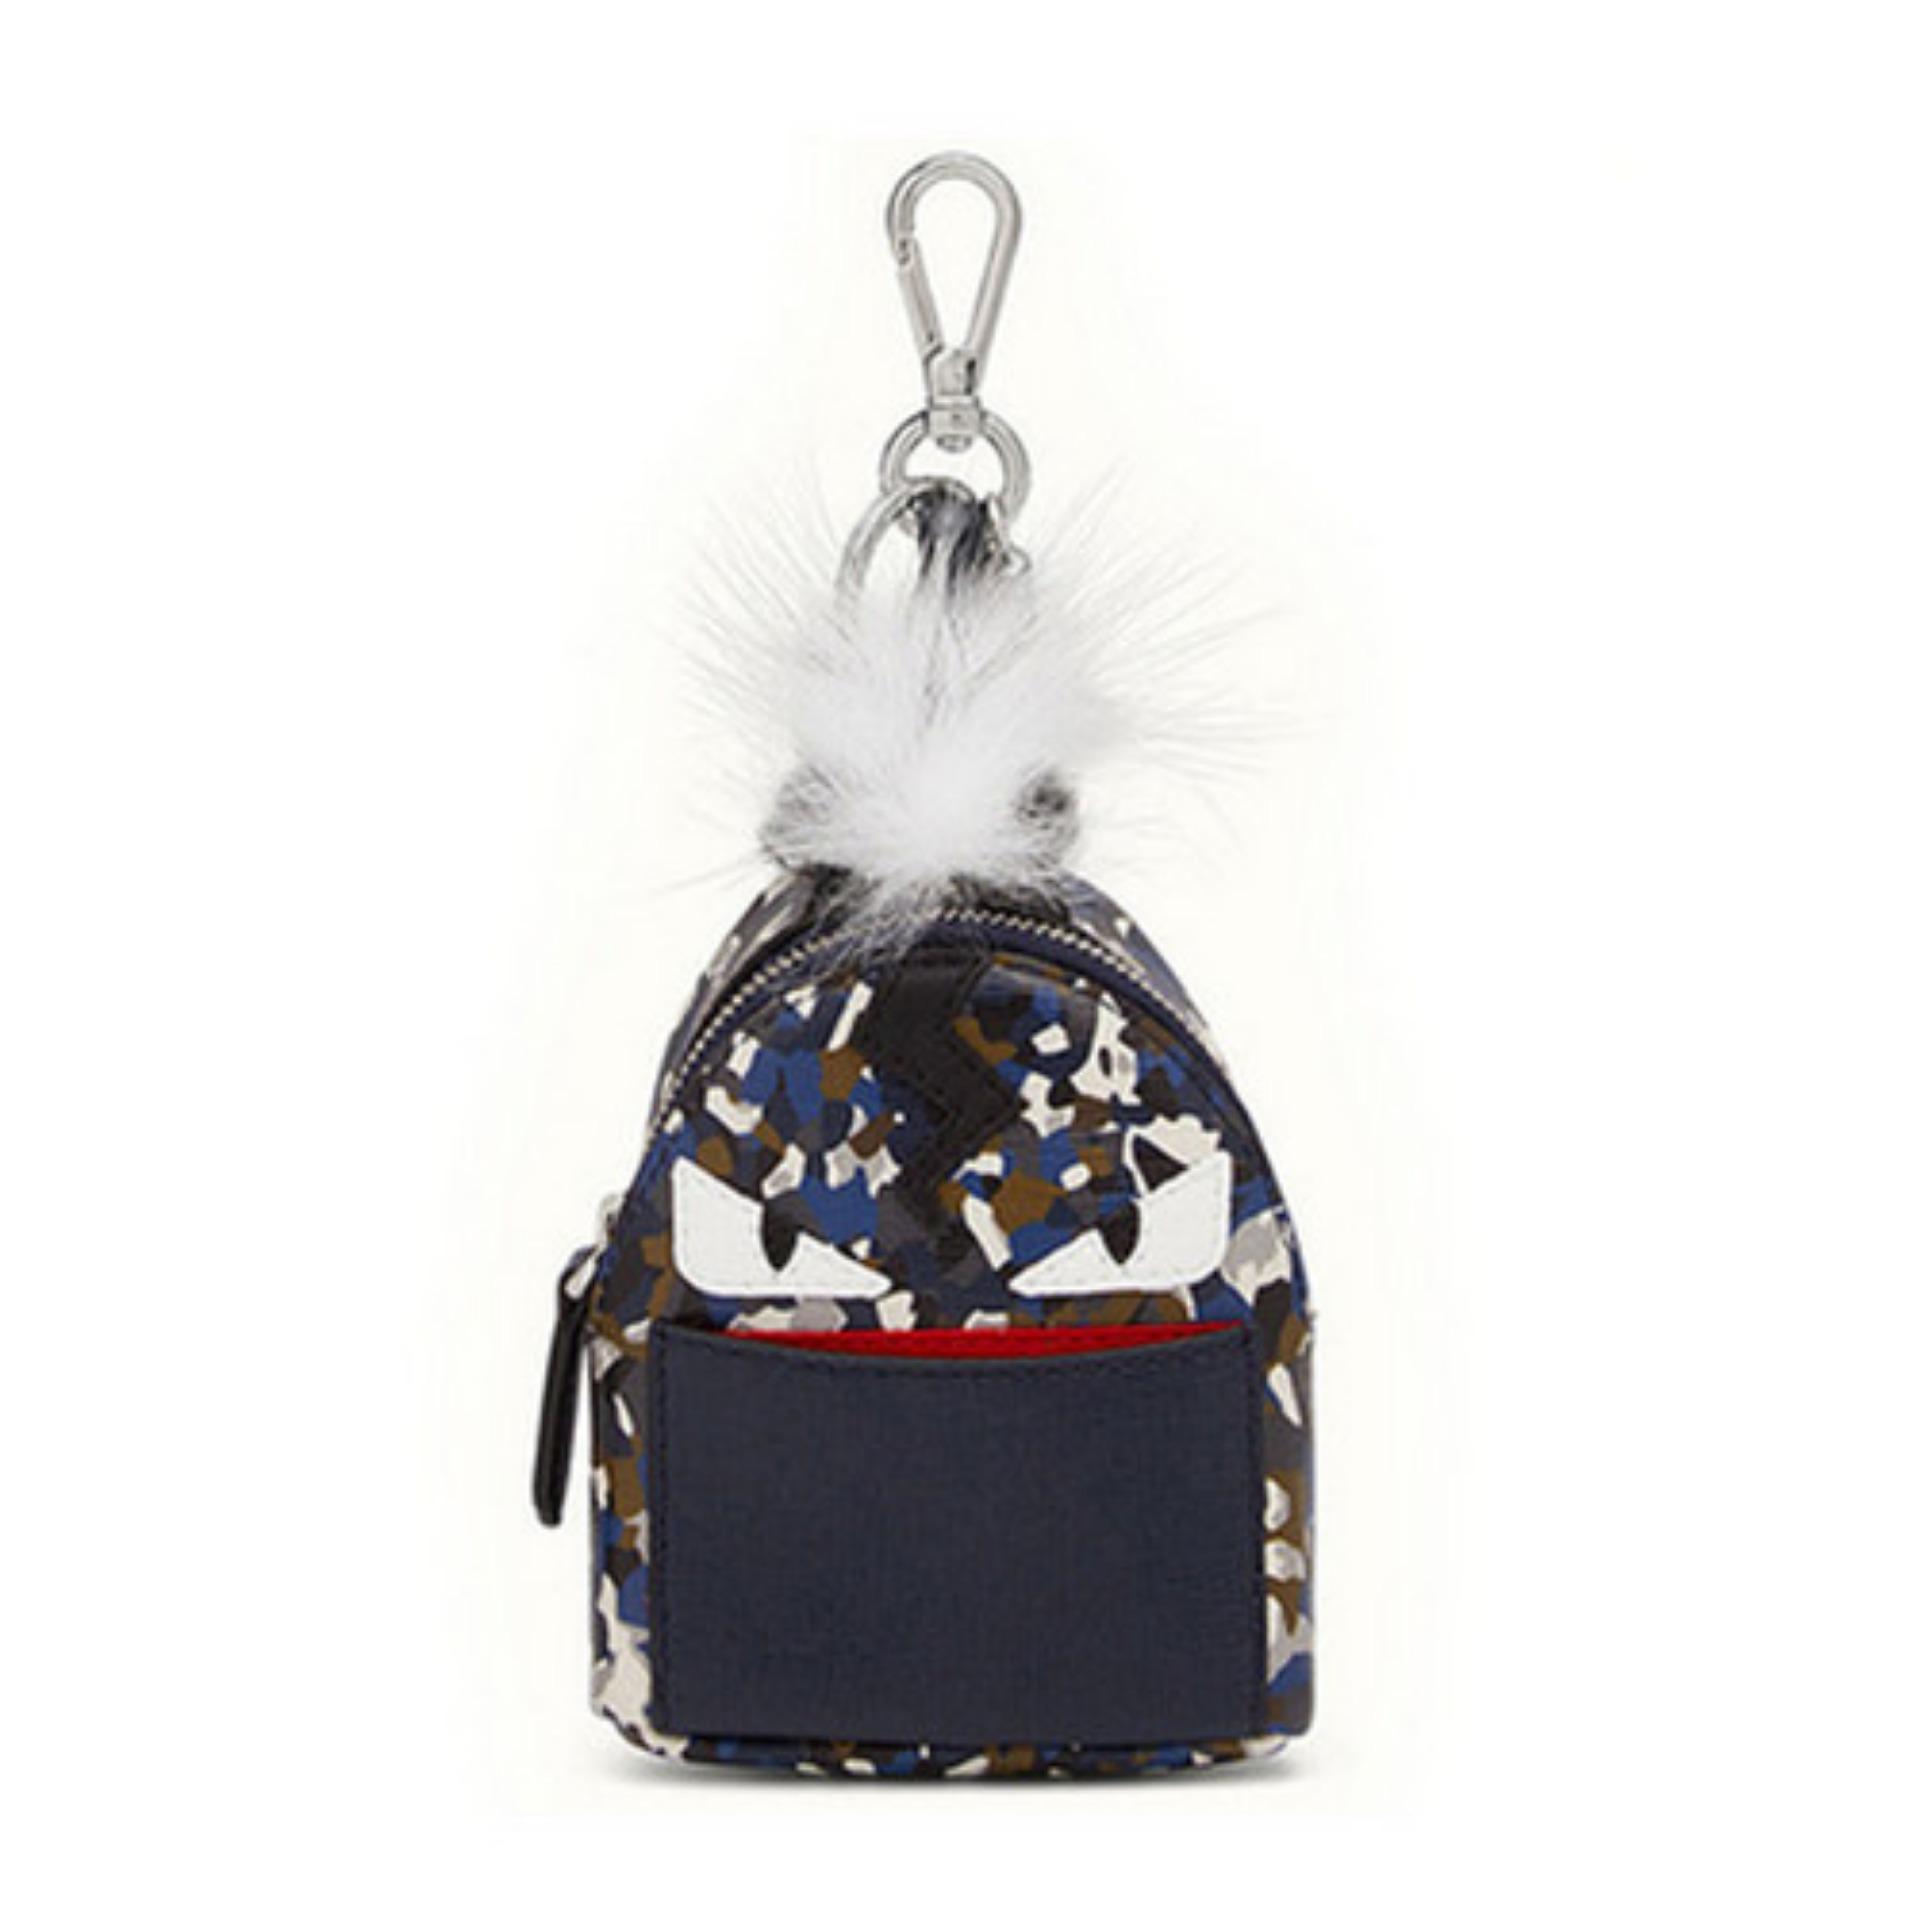 06fa0454f5 Fendi Monster Bagpack Charm Keyring (Multicolor) # 7AR4325X0F01XT